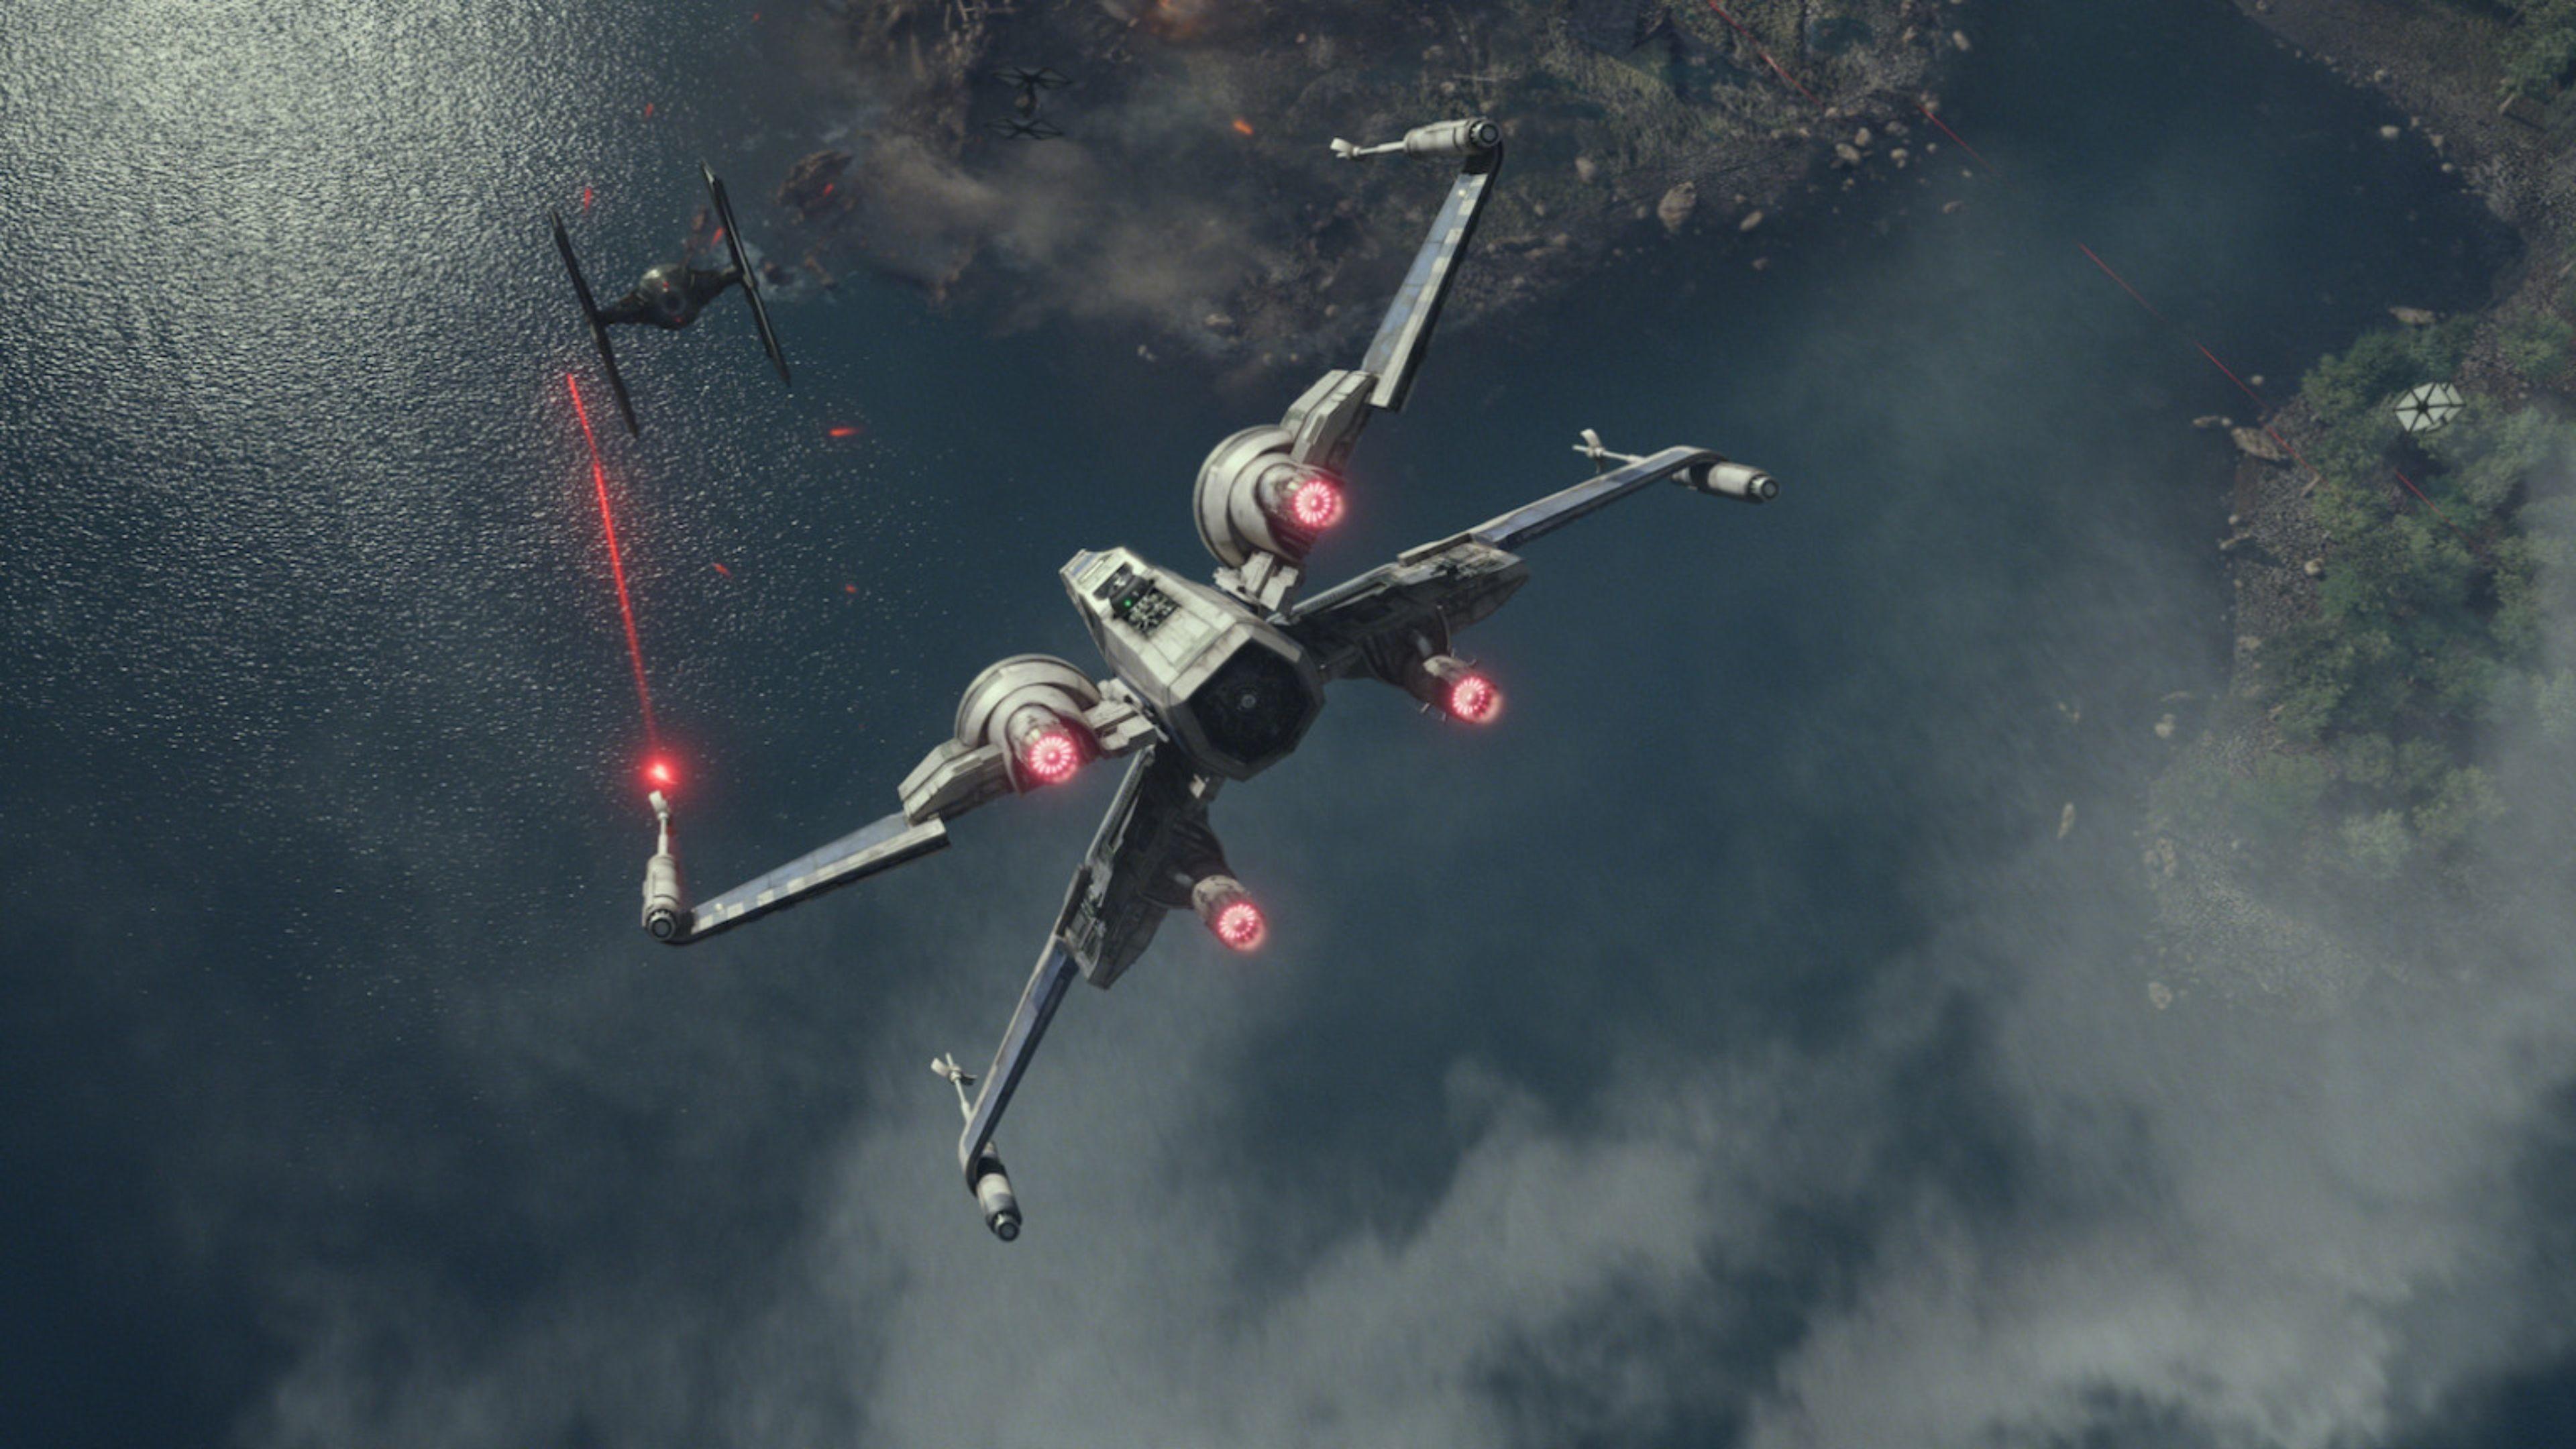 Free Star Wars The Force Awakens 4K Wallpaper